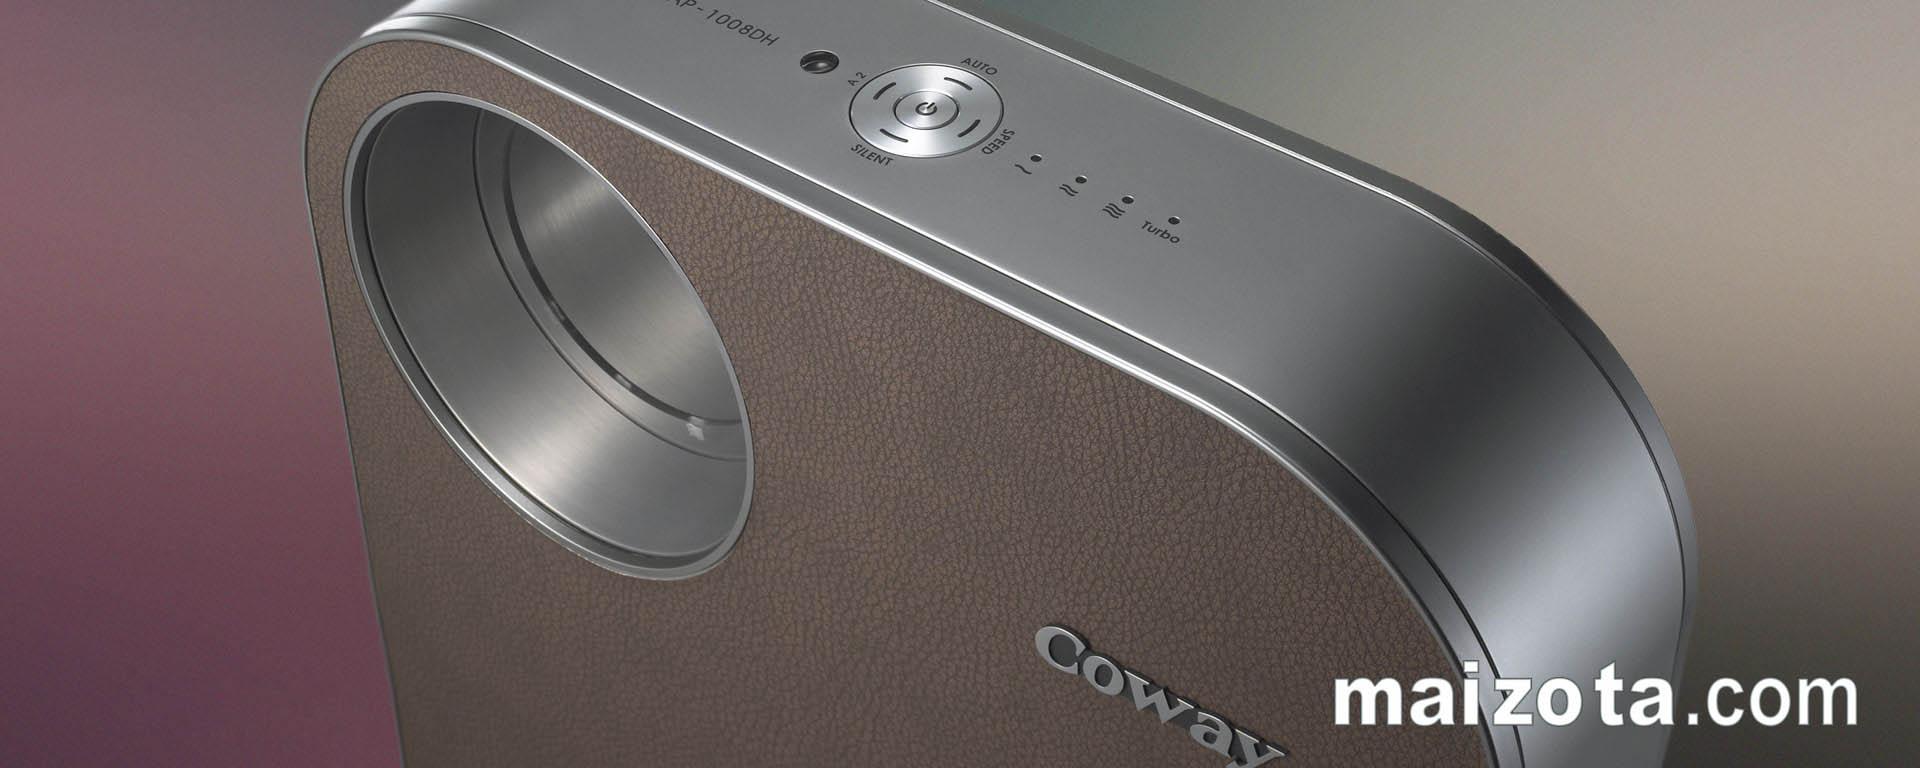 coway ap-1008dh-thiet-ke